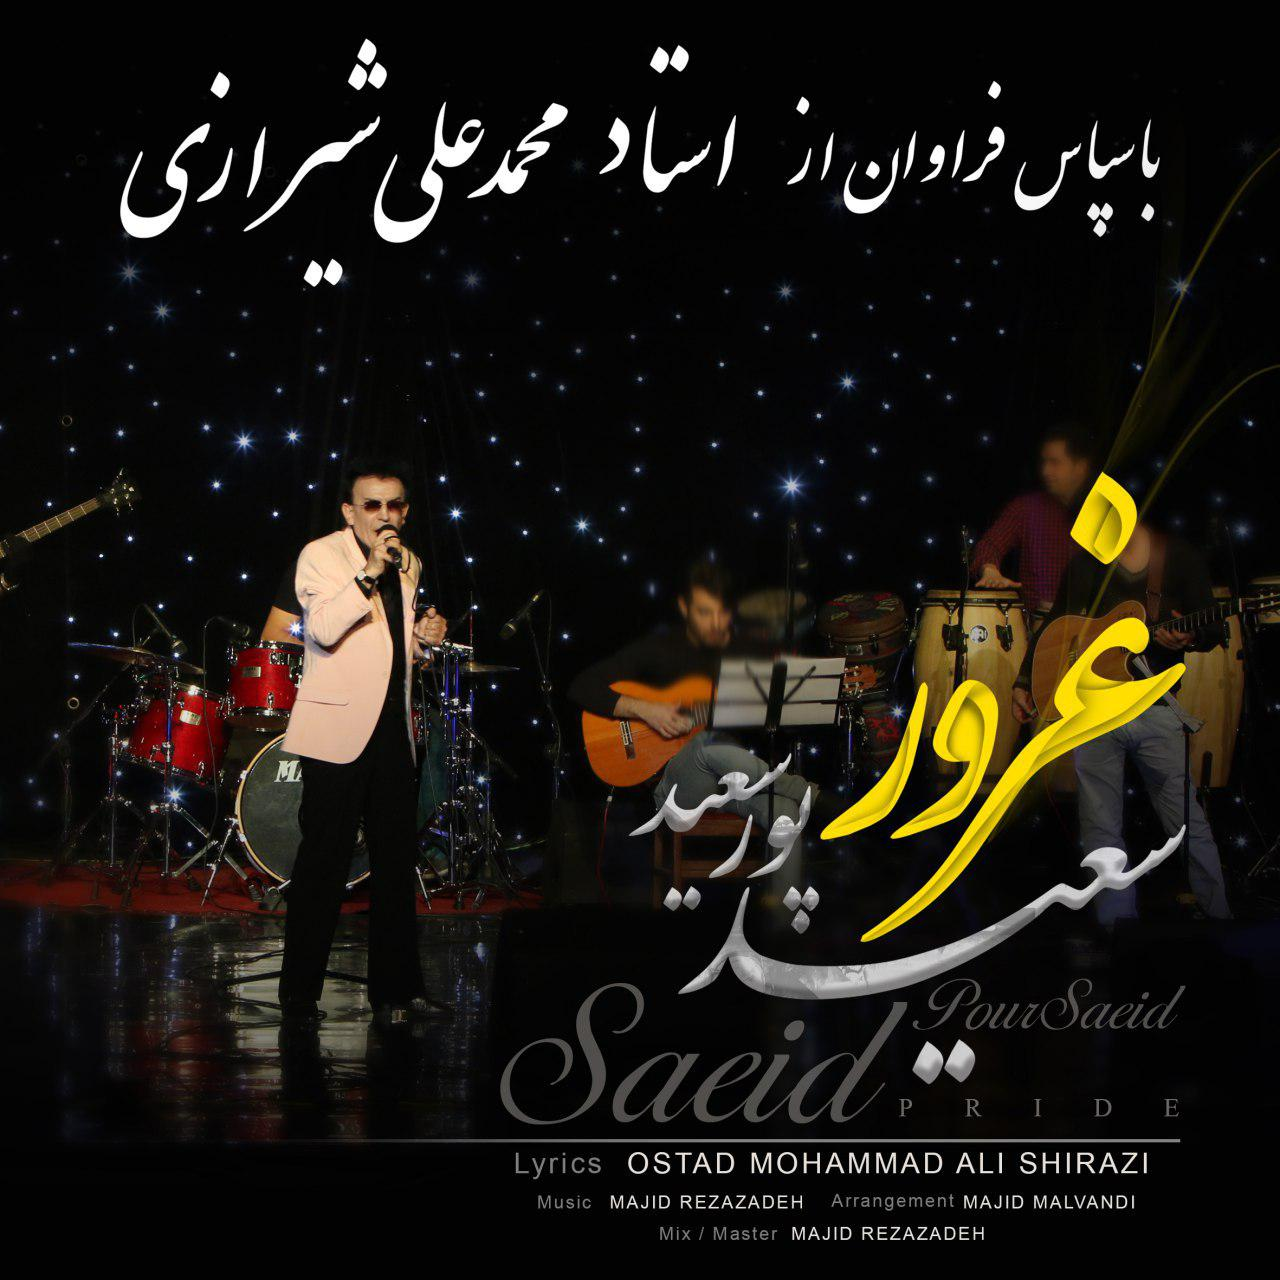 Saeid Poursaeid – Ghoroor